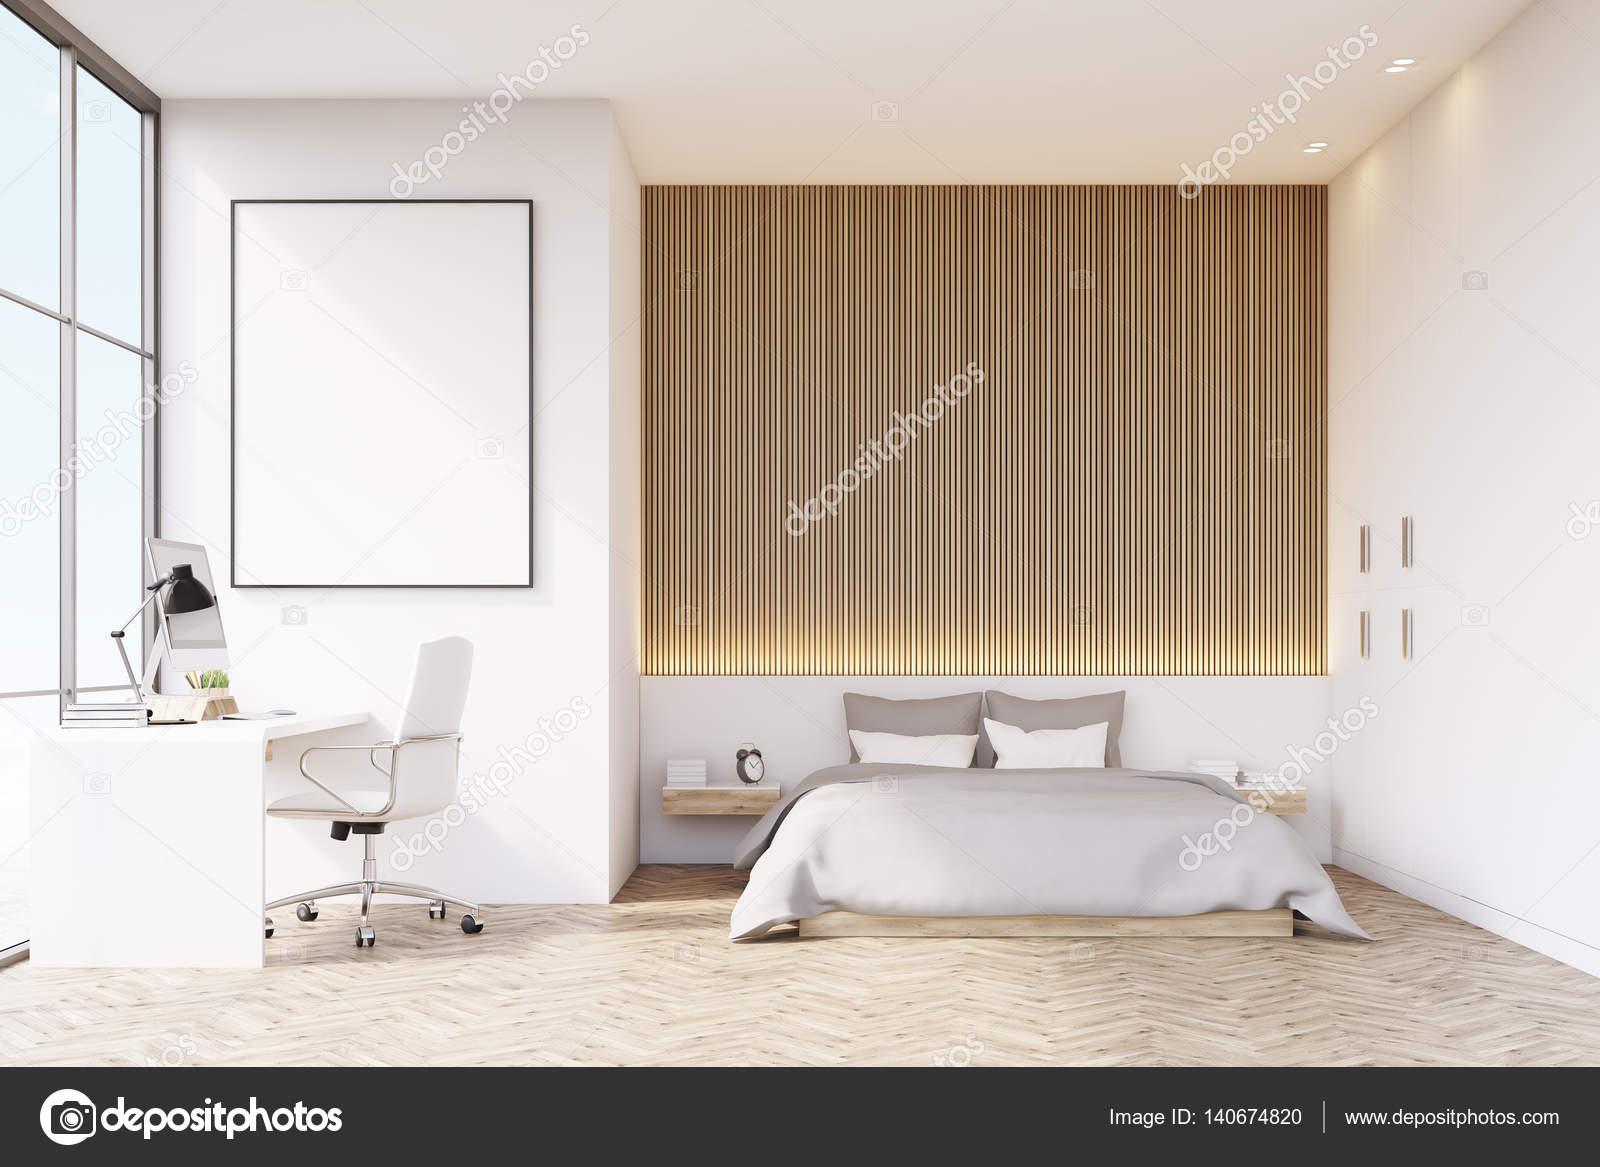 Houten Vloer Slaapkamer : Slaapkamer met houten vloer en tafel u2014 stockfoto © denisismagilov